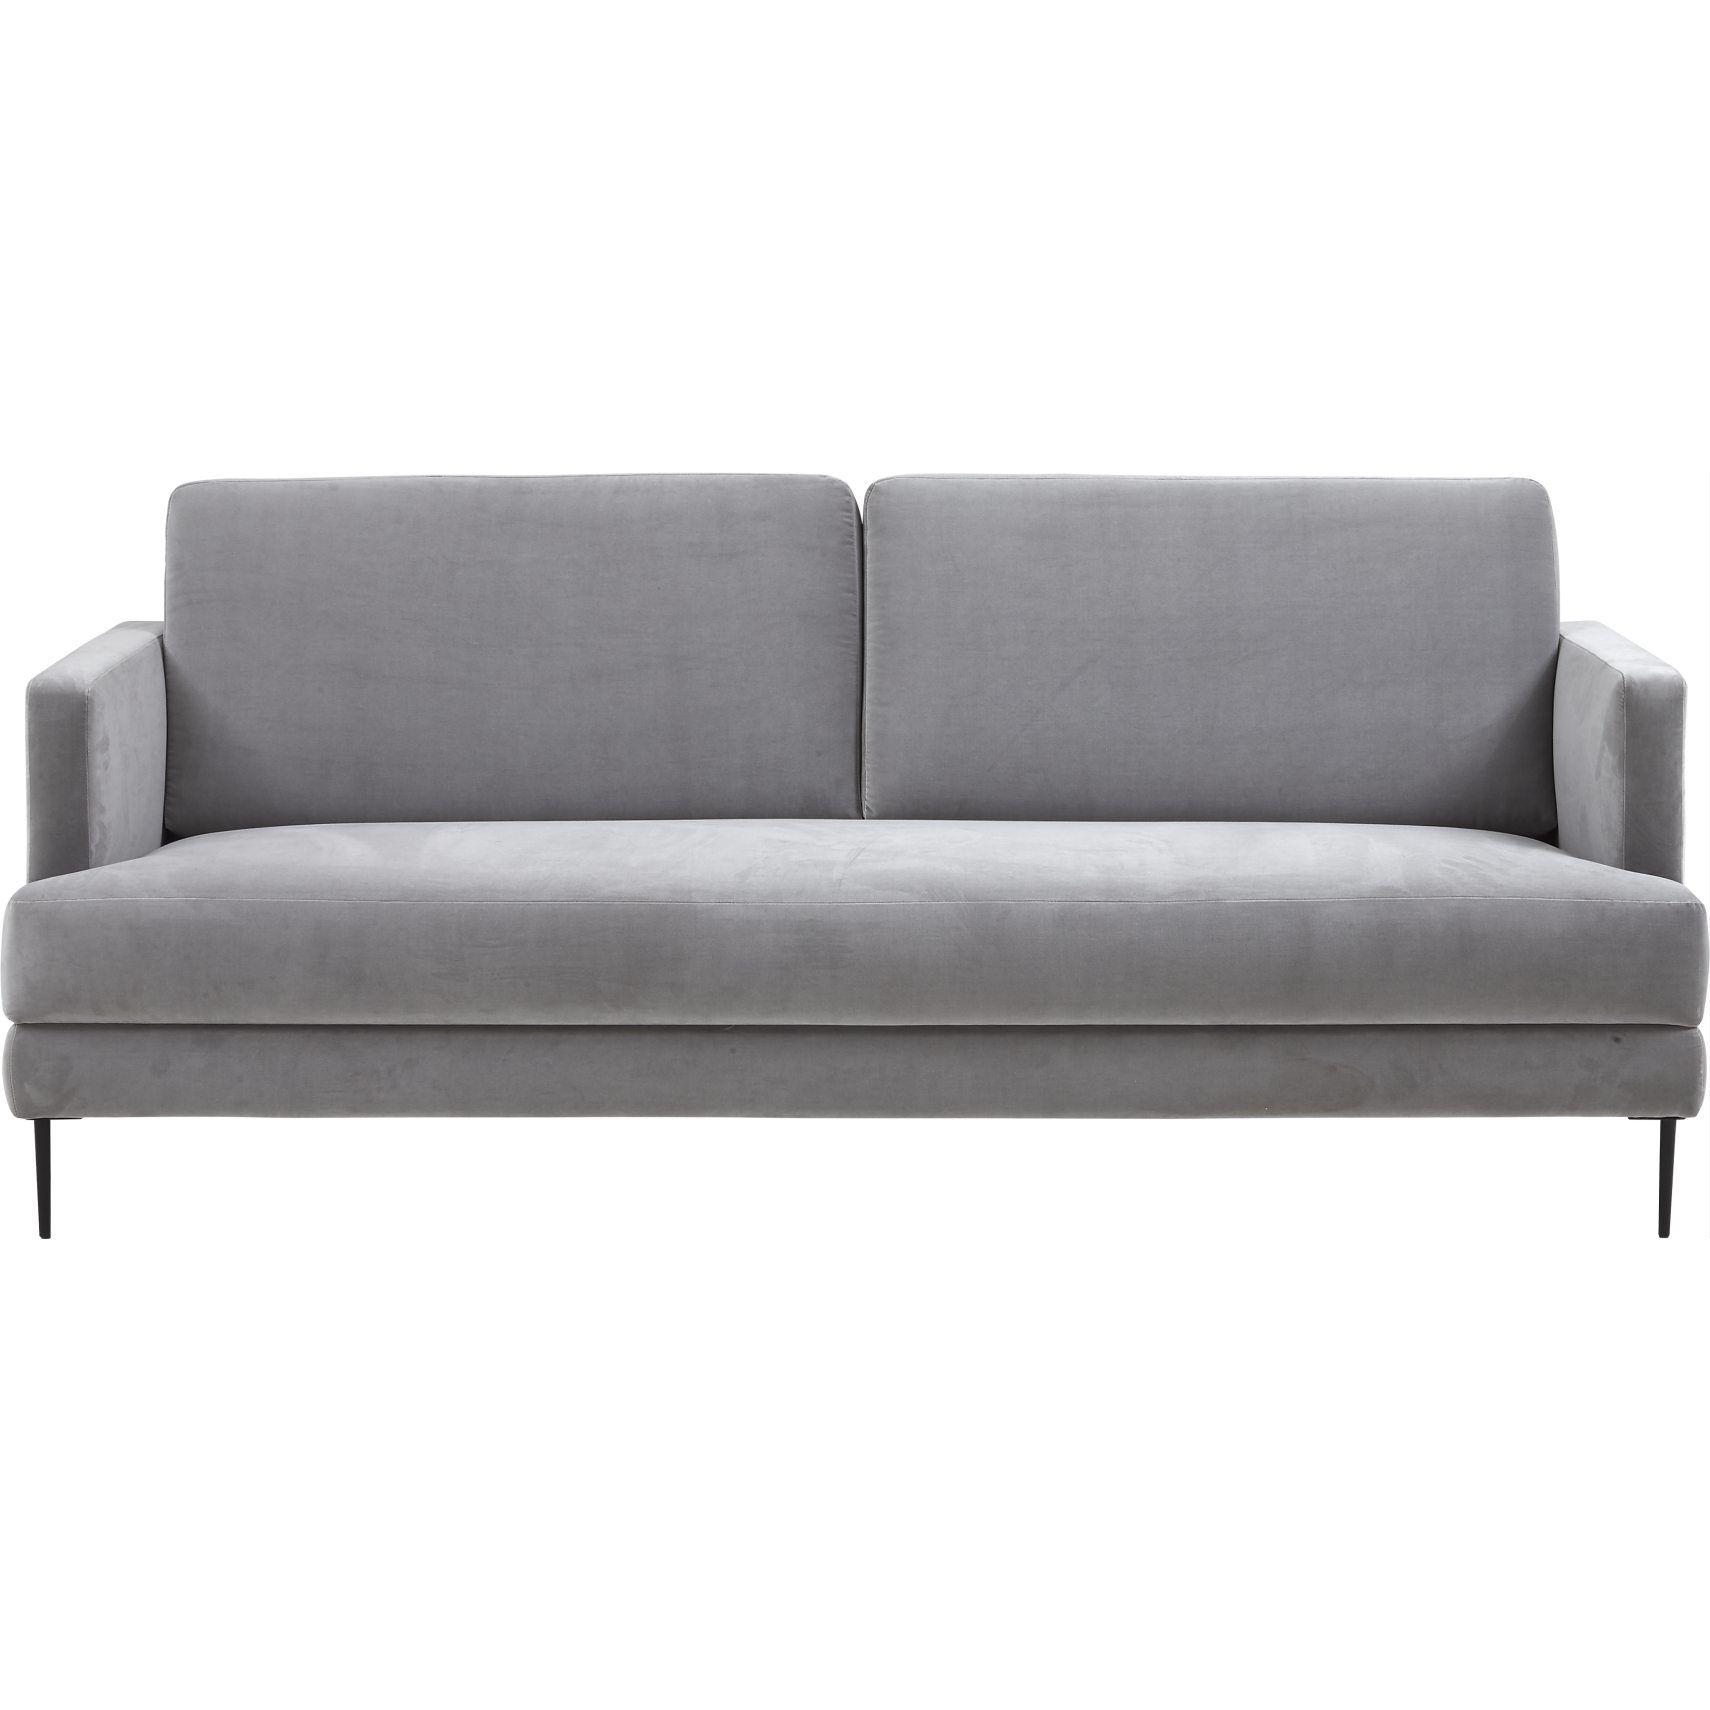 Fluente 286 grey stof